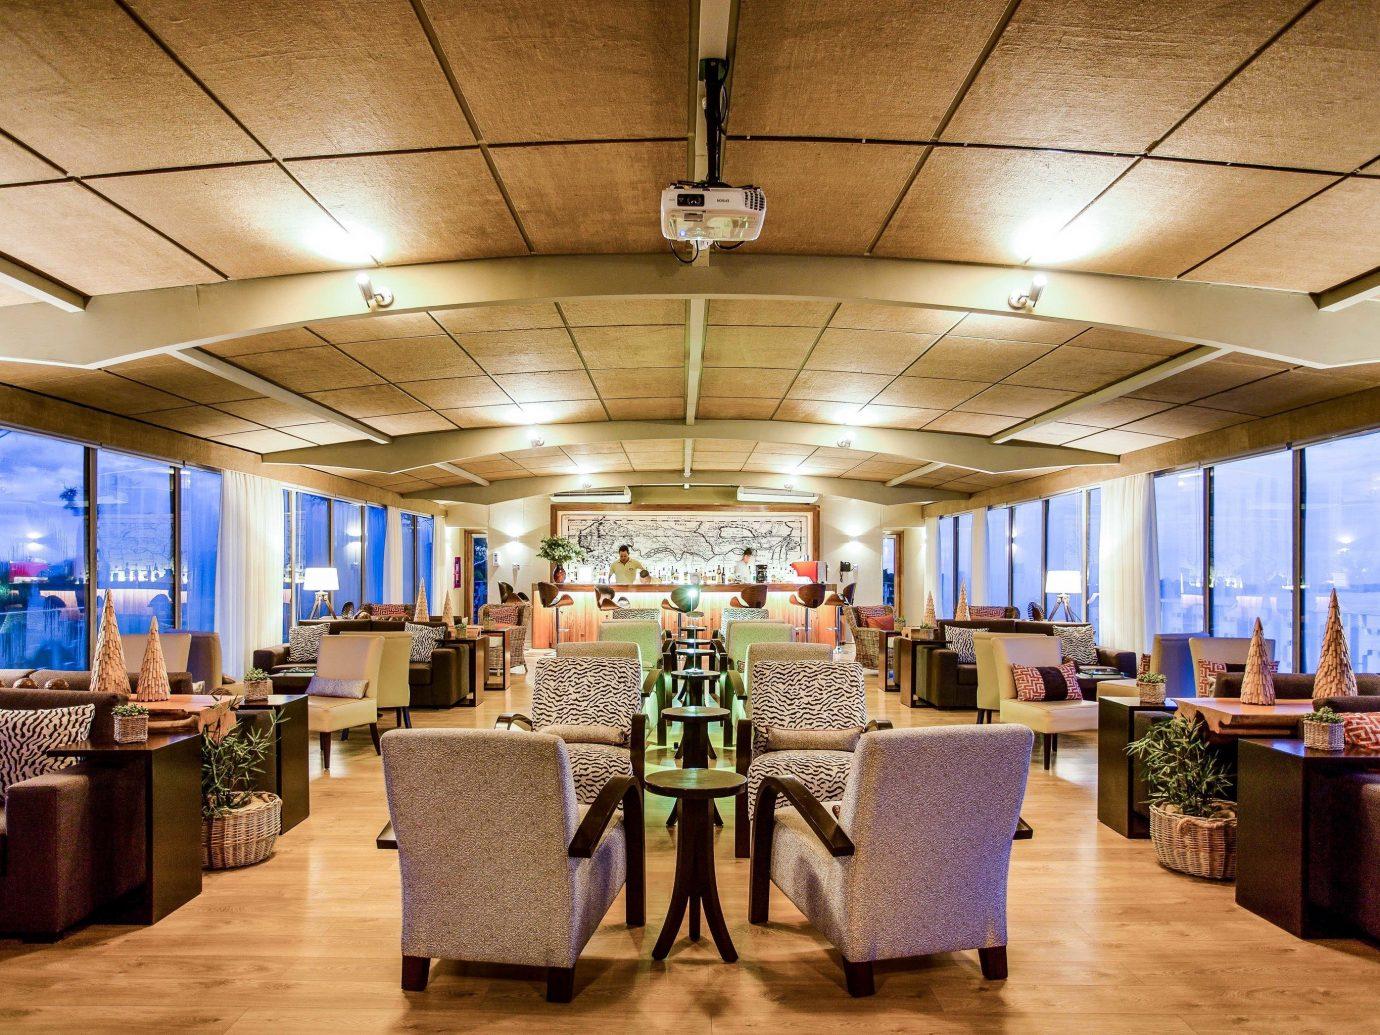 Cruise Travel Luxury Travel Outdoors + Adventure Trip Ideas indoor ceiling floor restaurant room interior design function hall Lobby area furniture